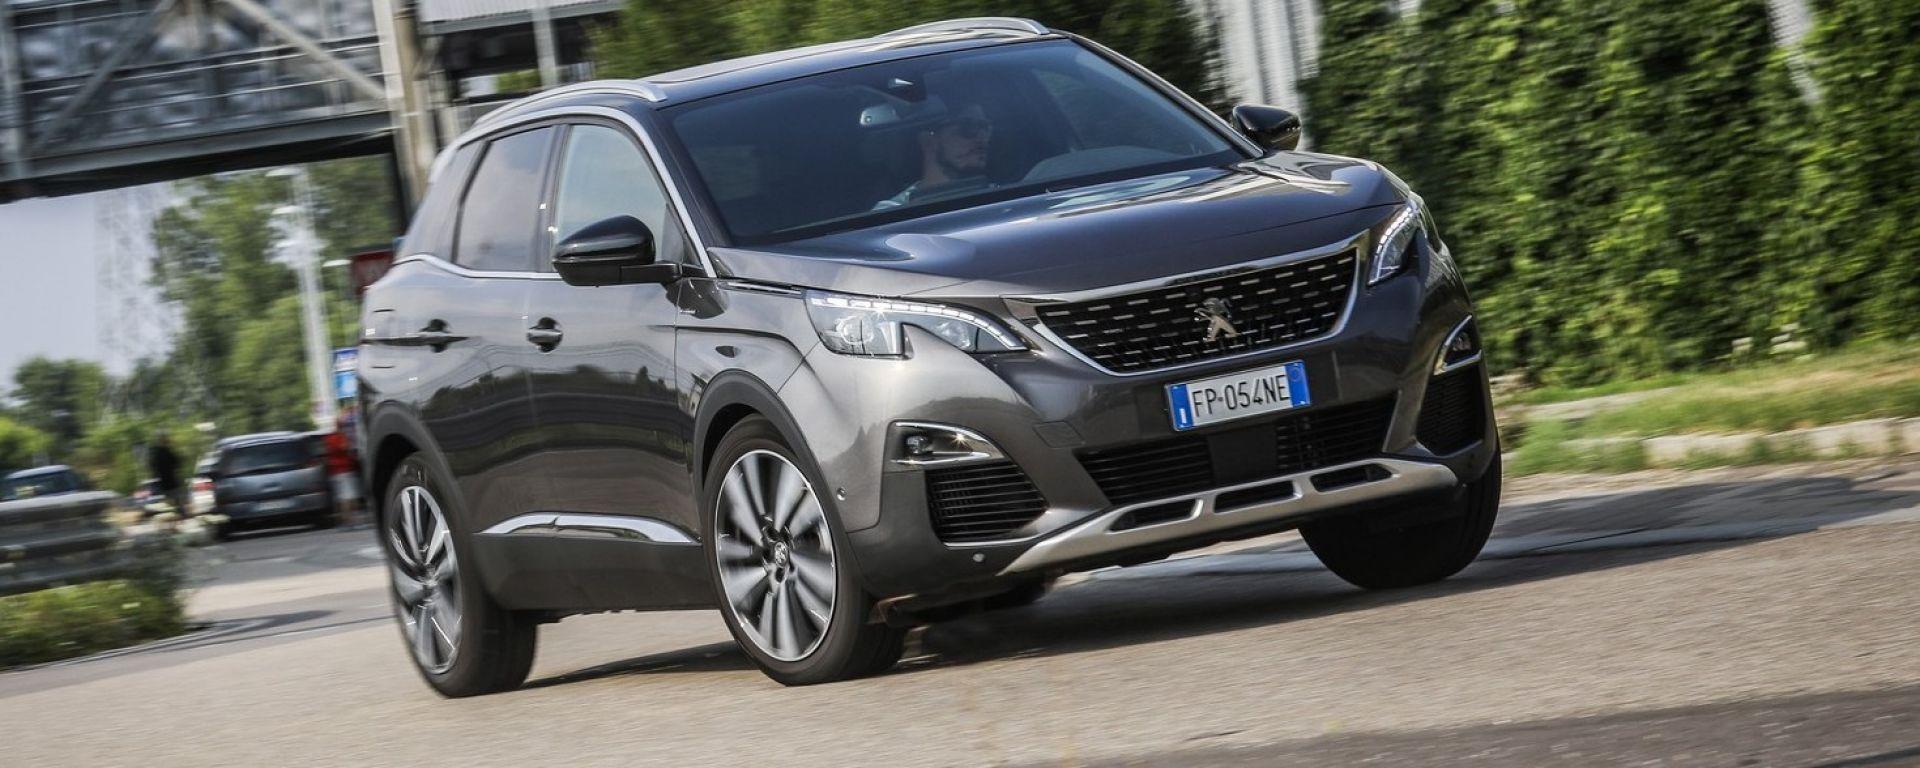 Peugeot 3008 1.5 diesel 130 cv: opinioni, pregi e difetti